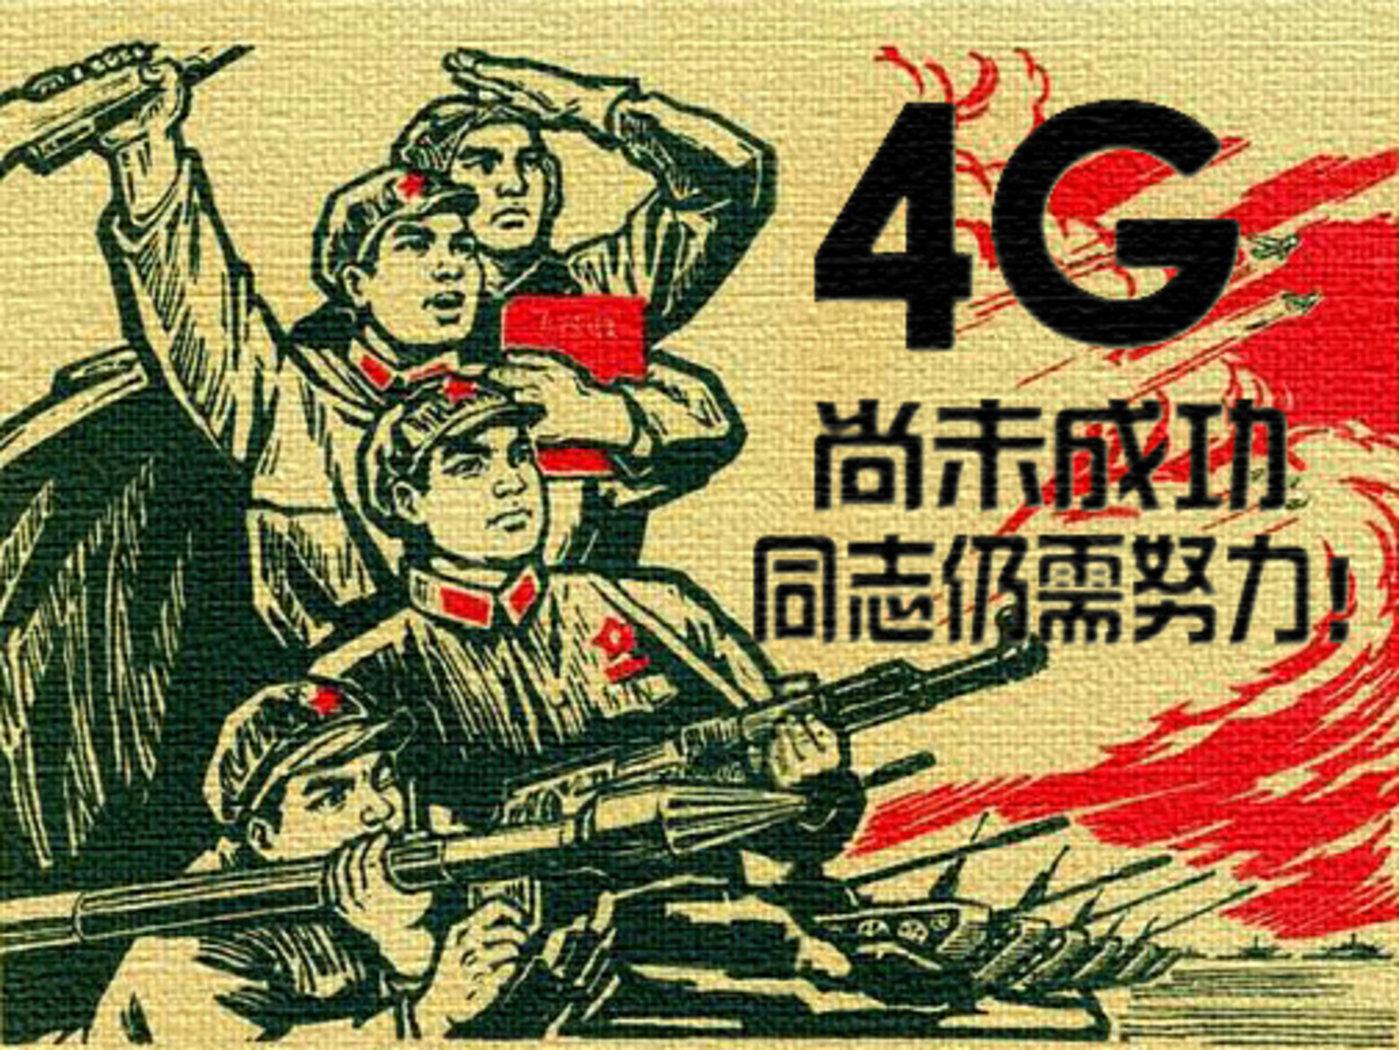 4G,别亢奋太早!